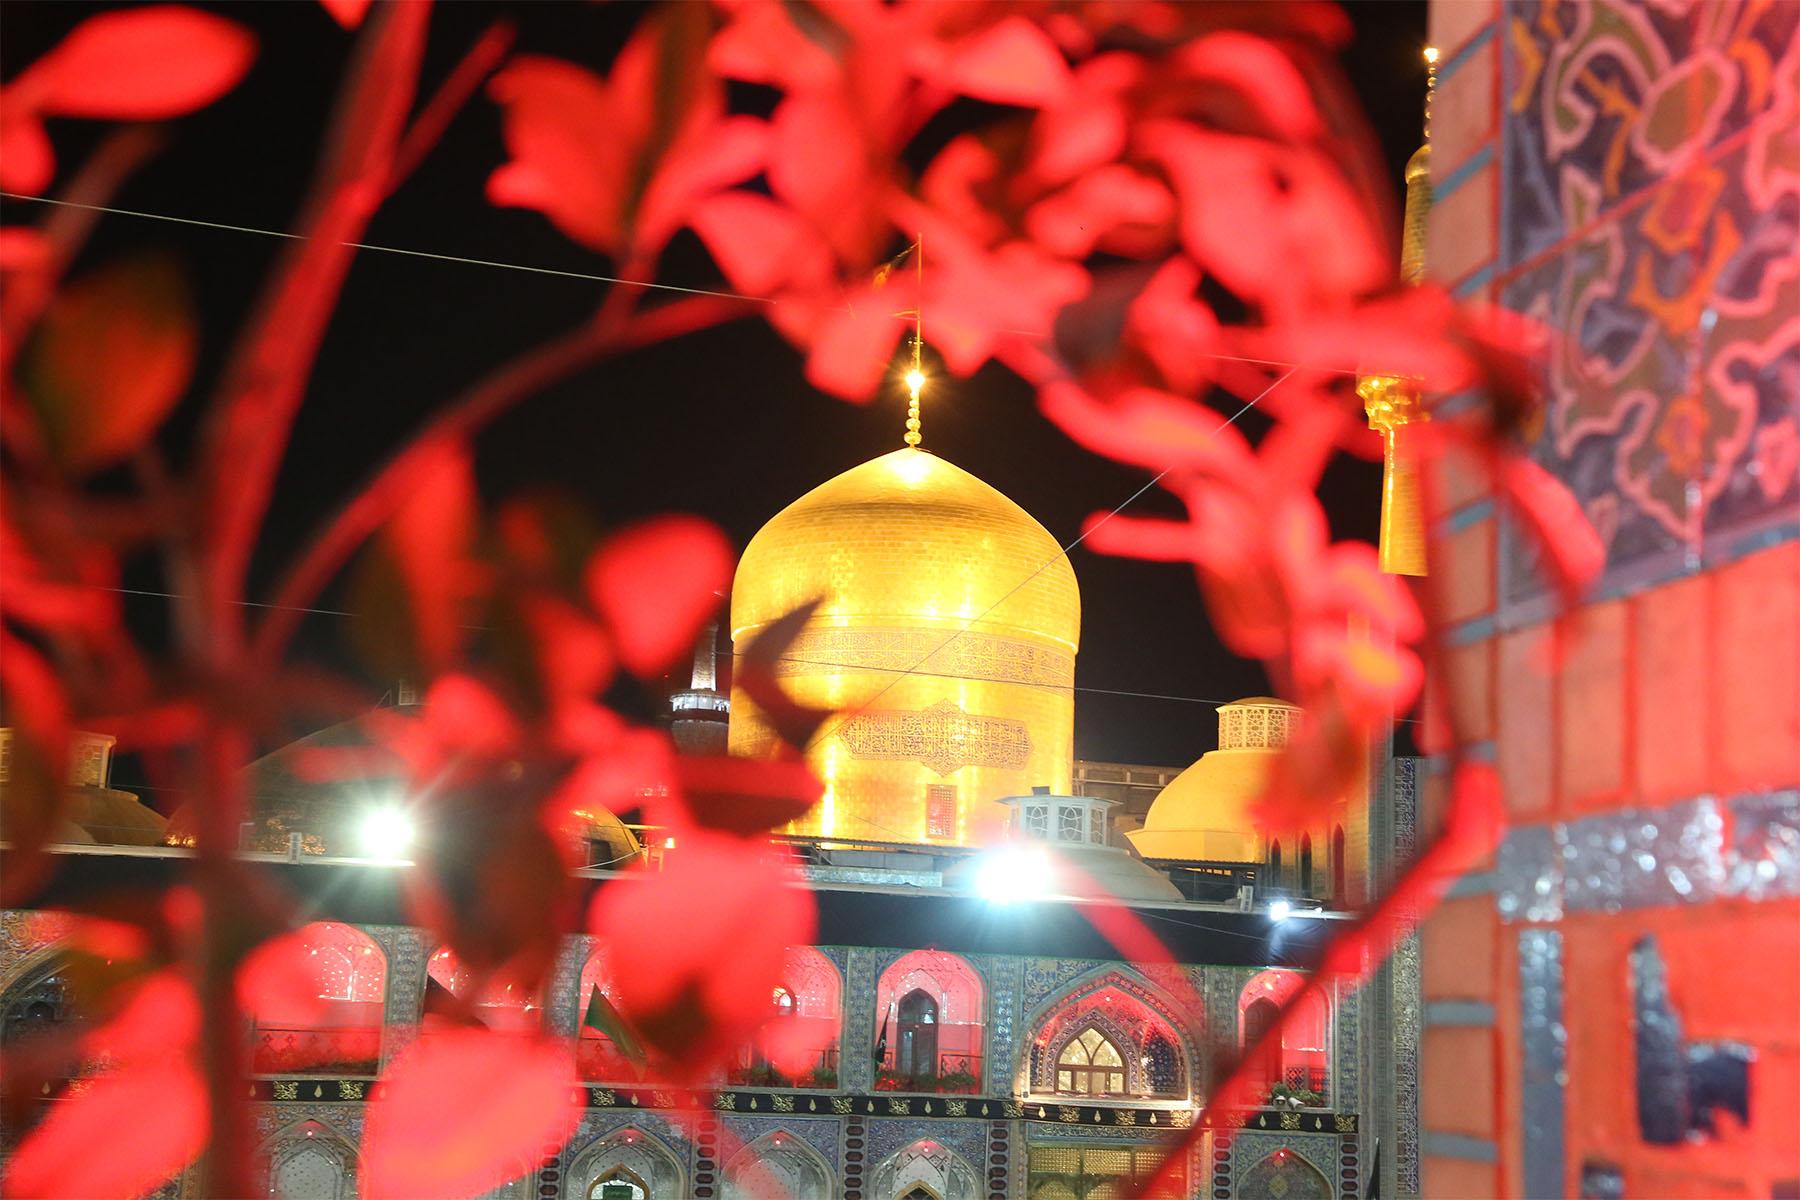 تور مشهد هوایی – ویژه عید مبعث رسول اکرم (ص)